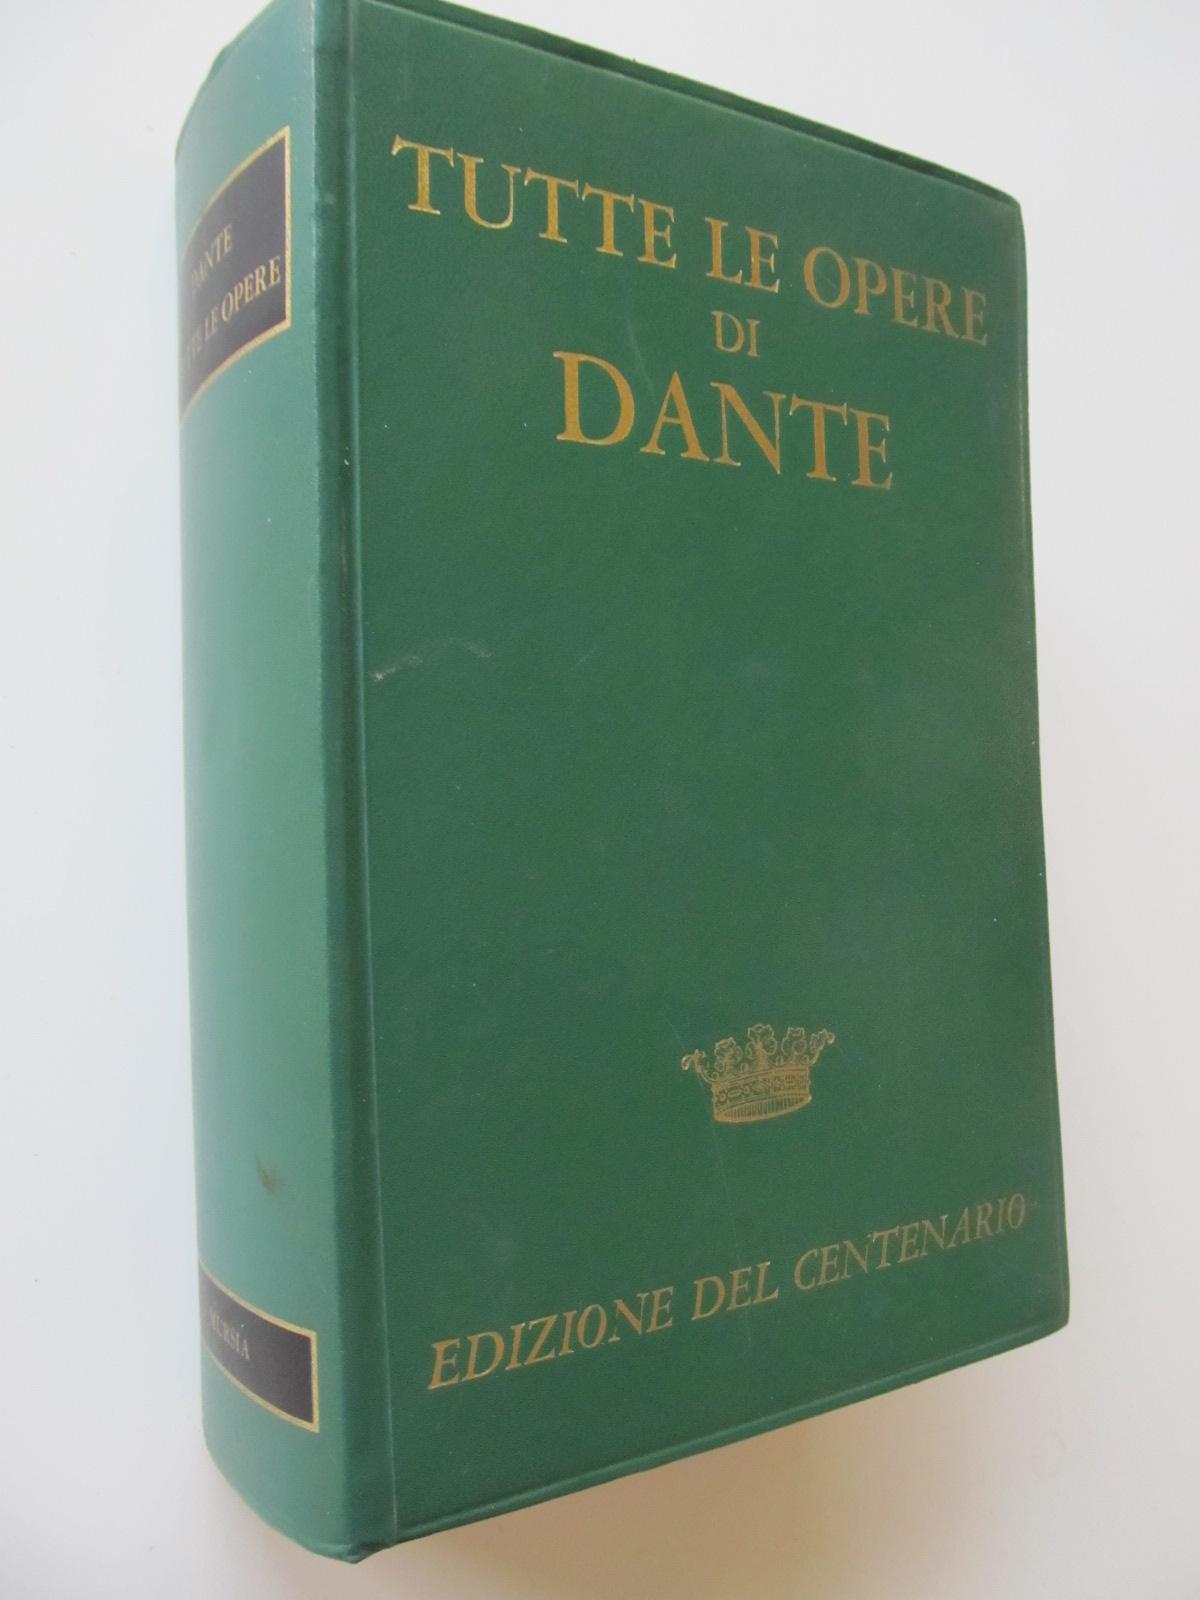 Tutte le opere di Dante (toate operele) - Editione del centenario - Dante Alighieri | Detalii carte